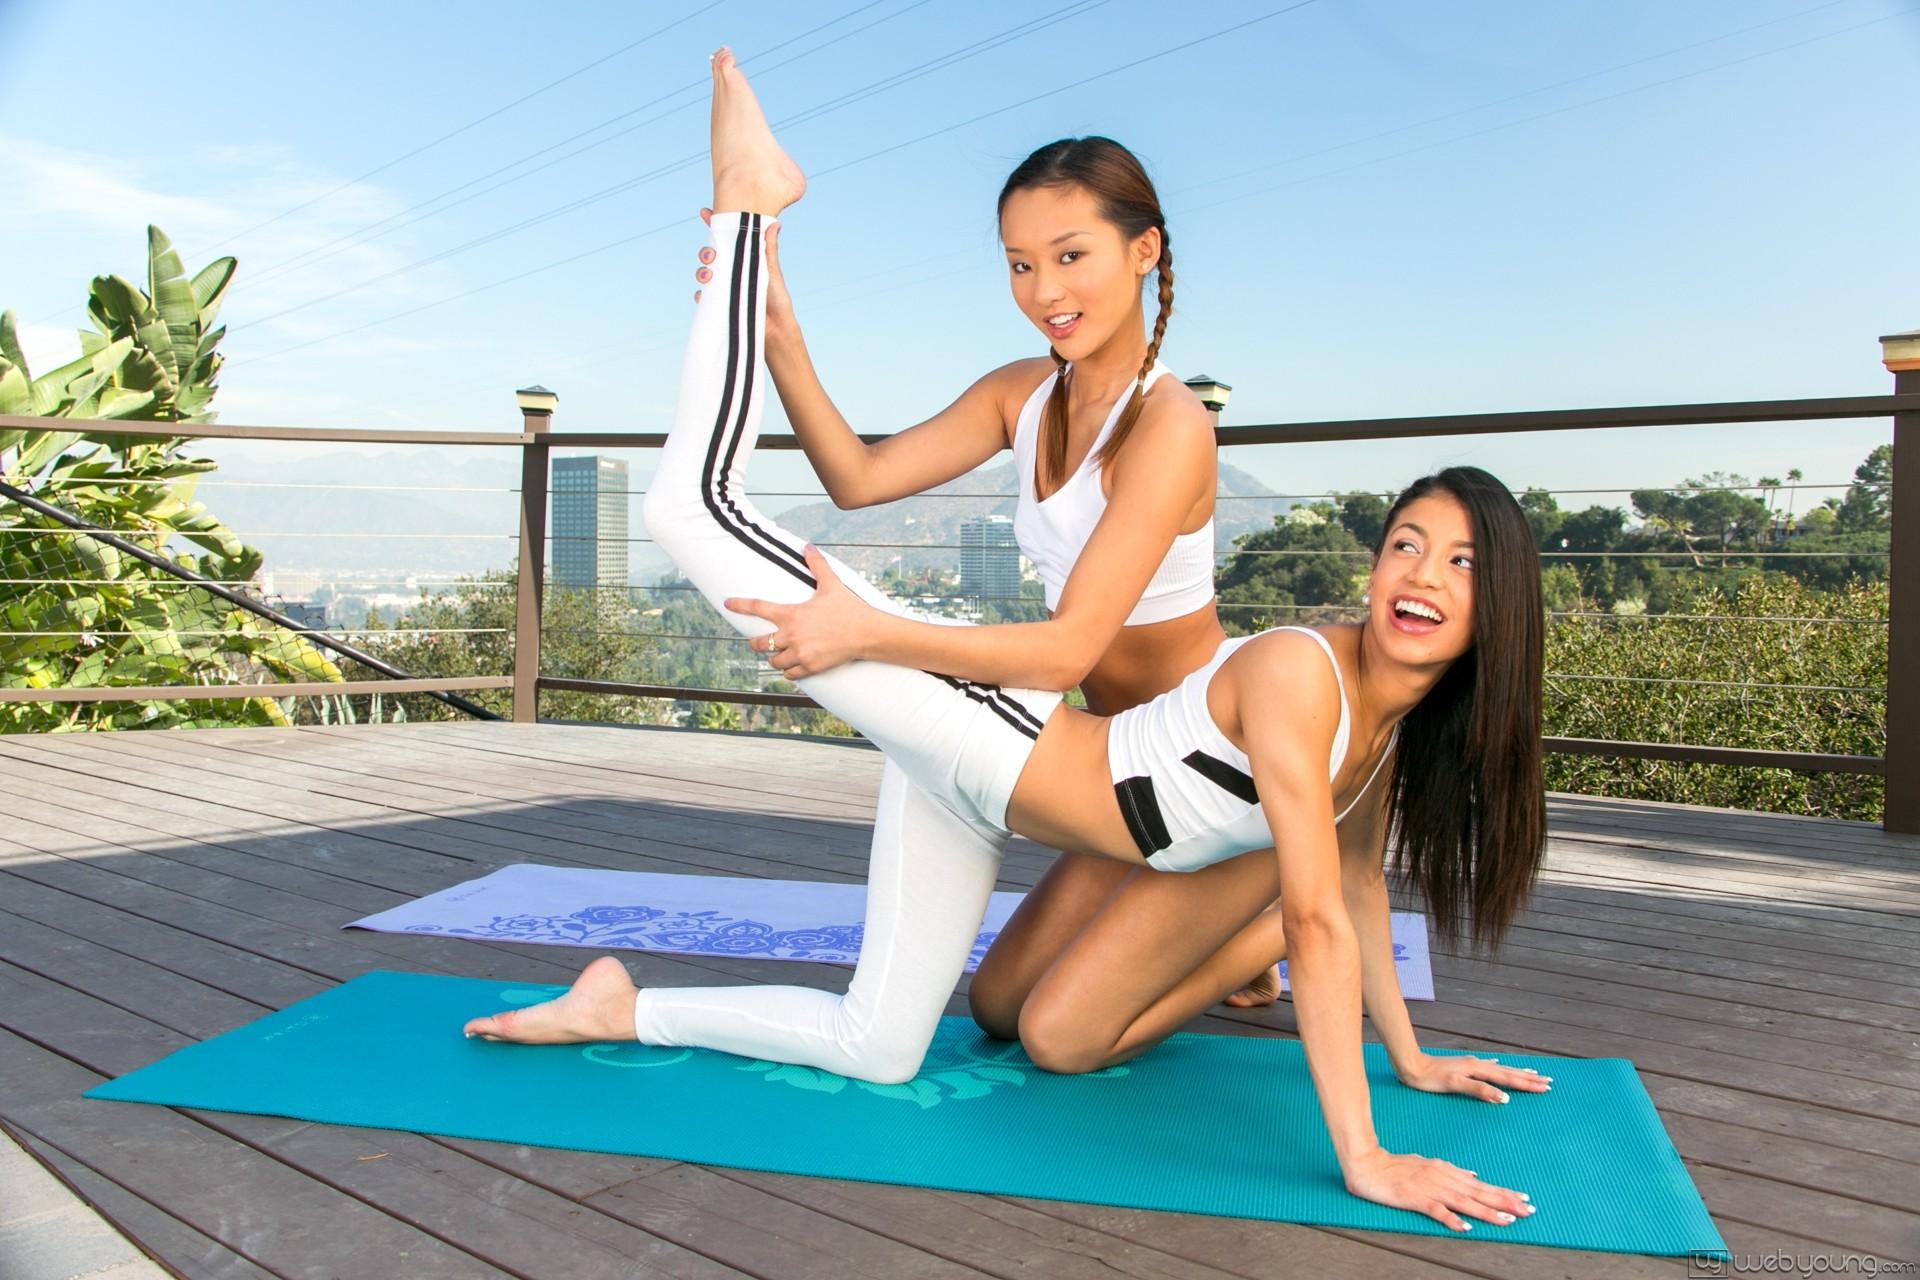 Naked Yoga Lesbian - Lesbian yoga porn - Pichunter